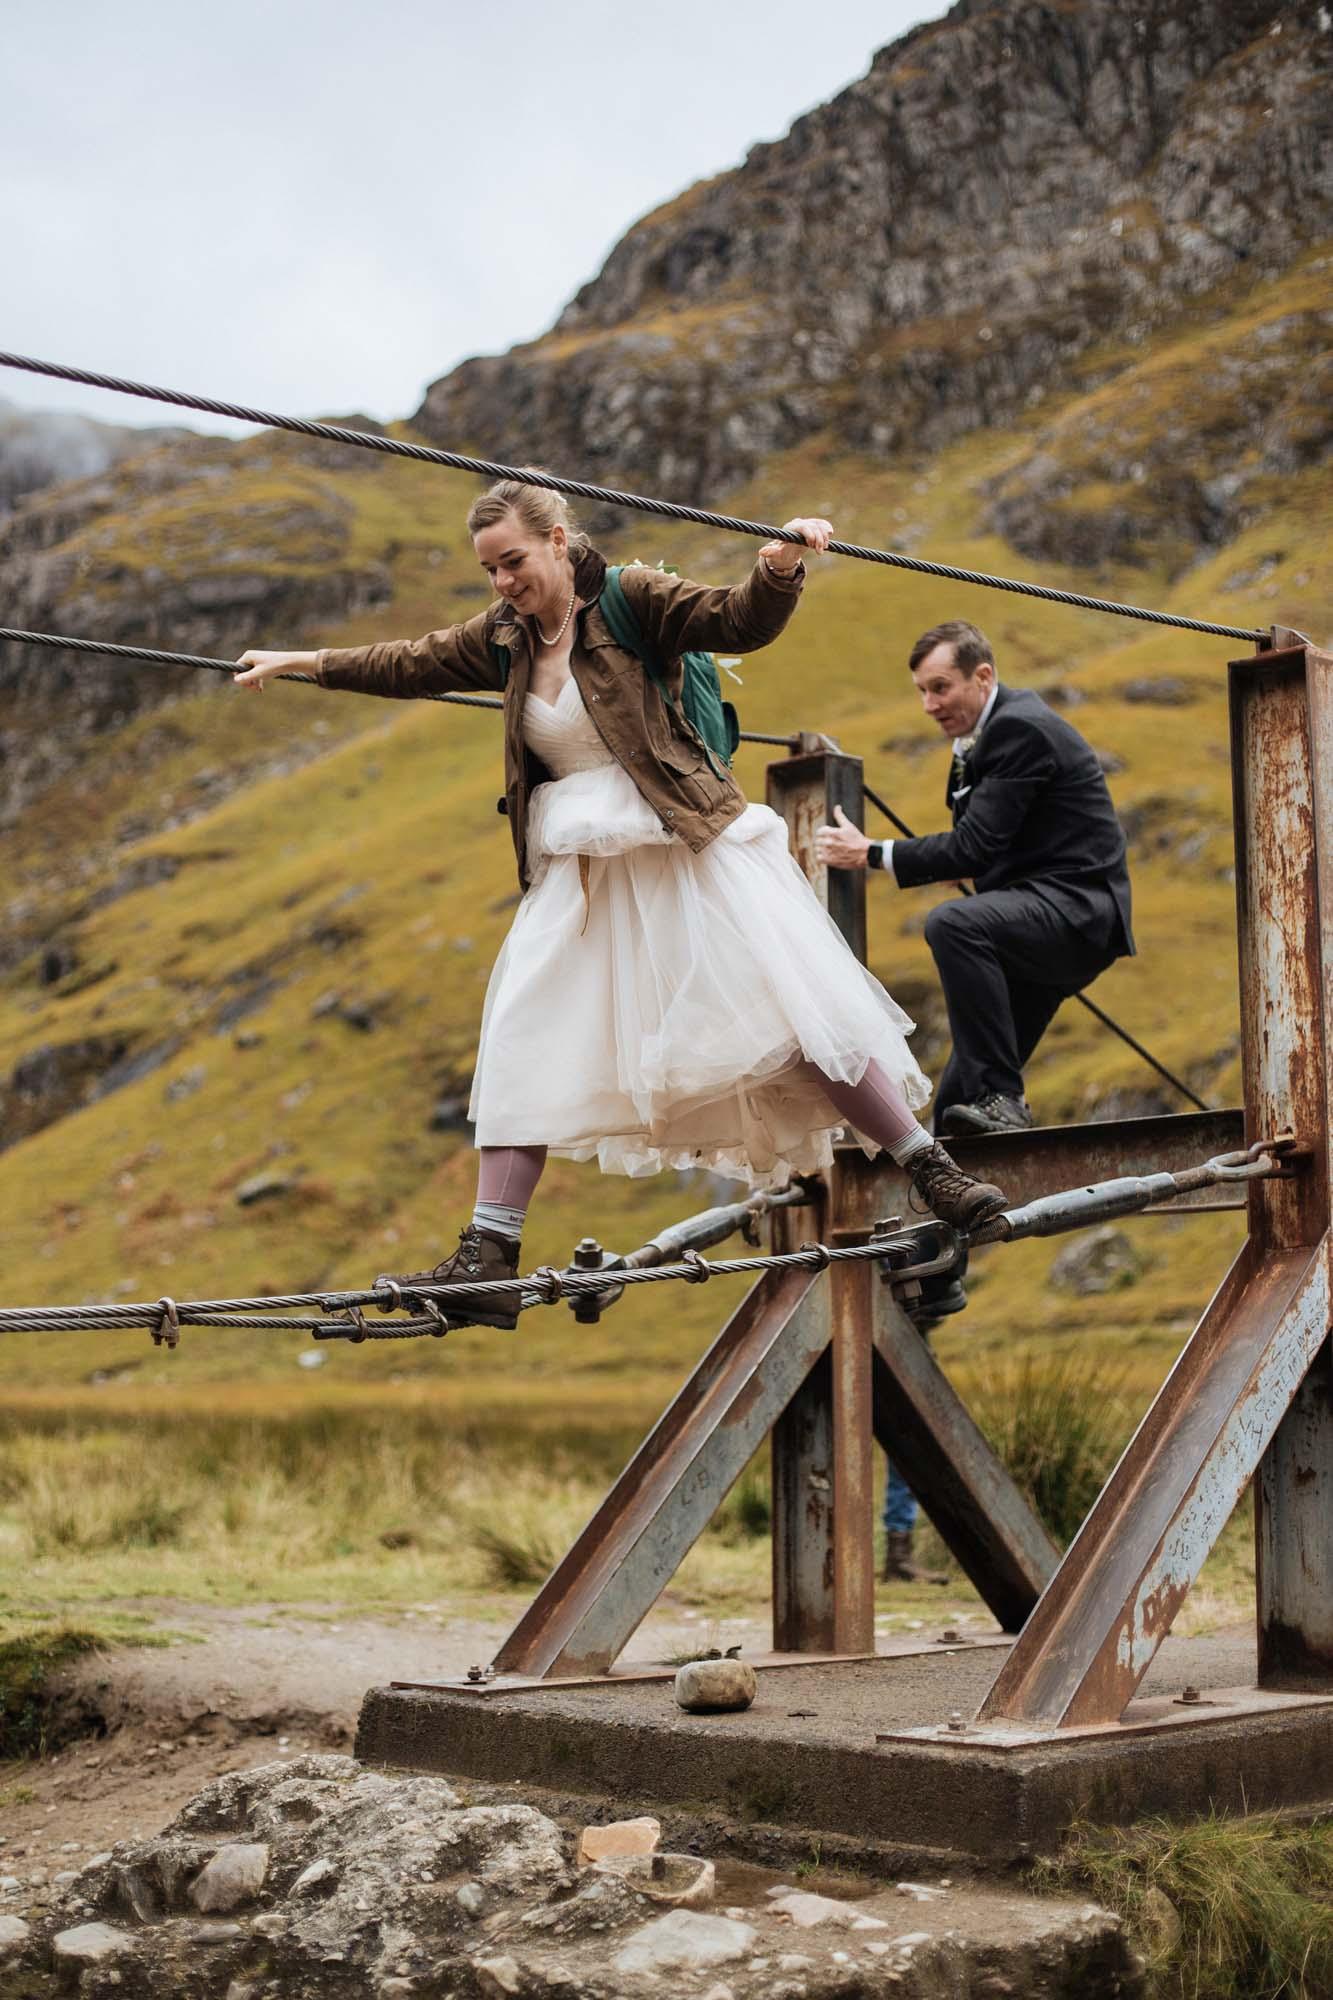 Hiking Elopement in Scotland | Rope Bridge Bride